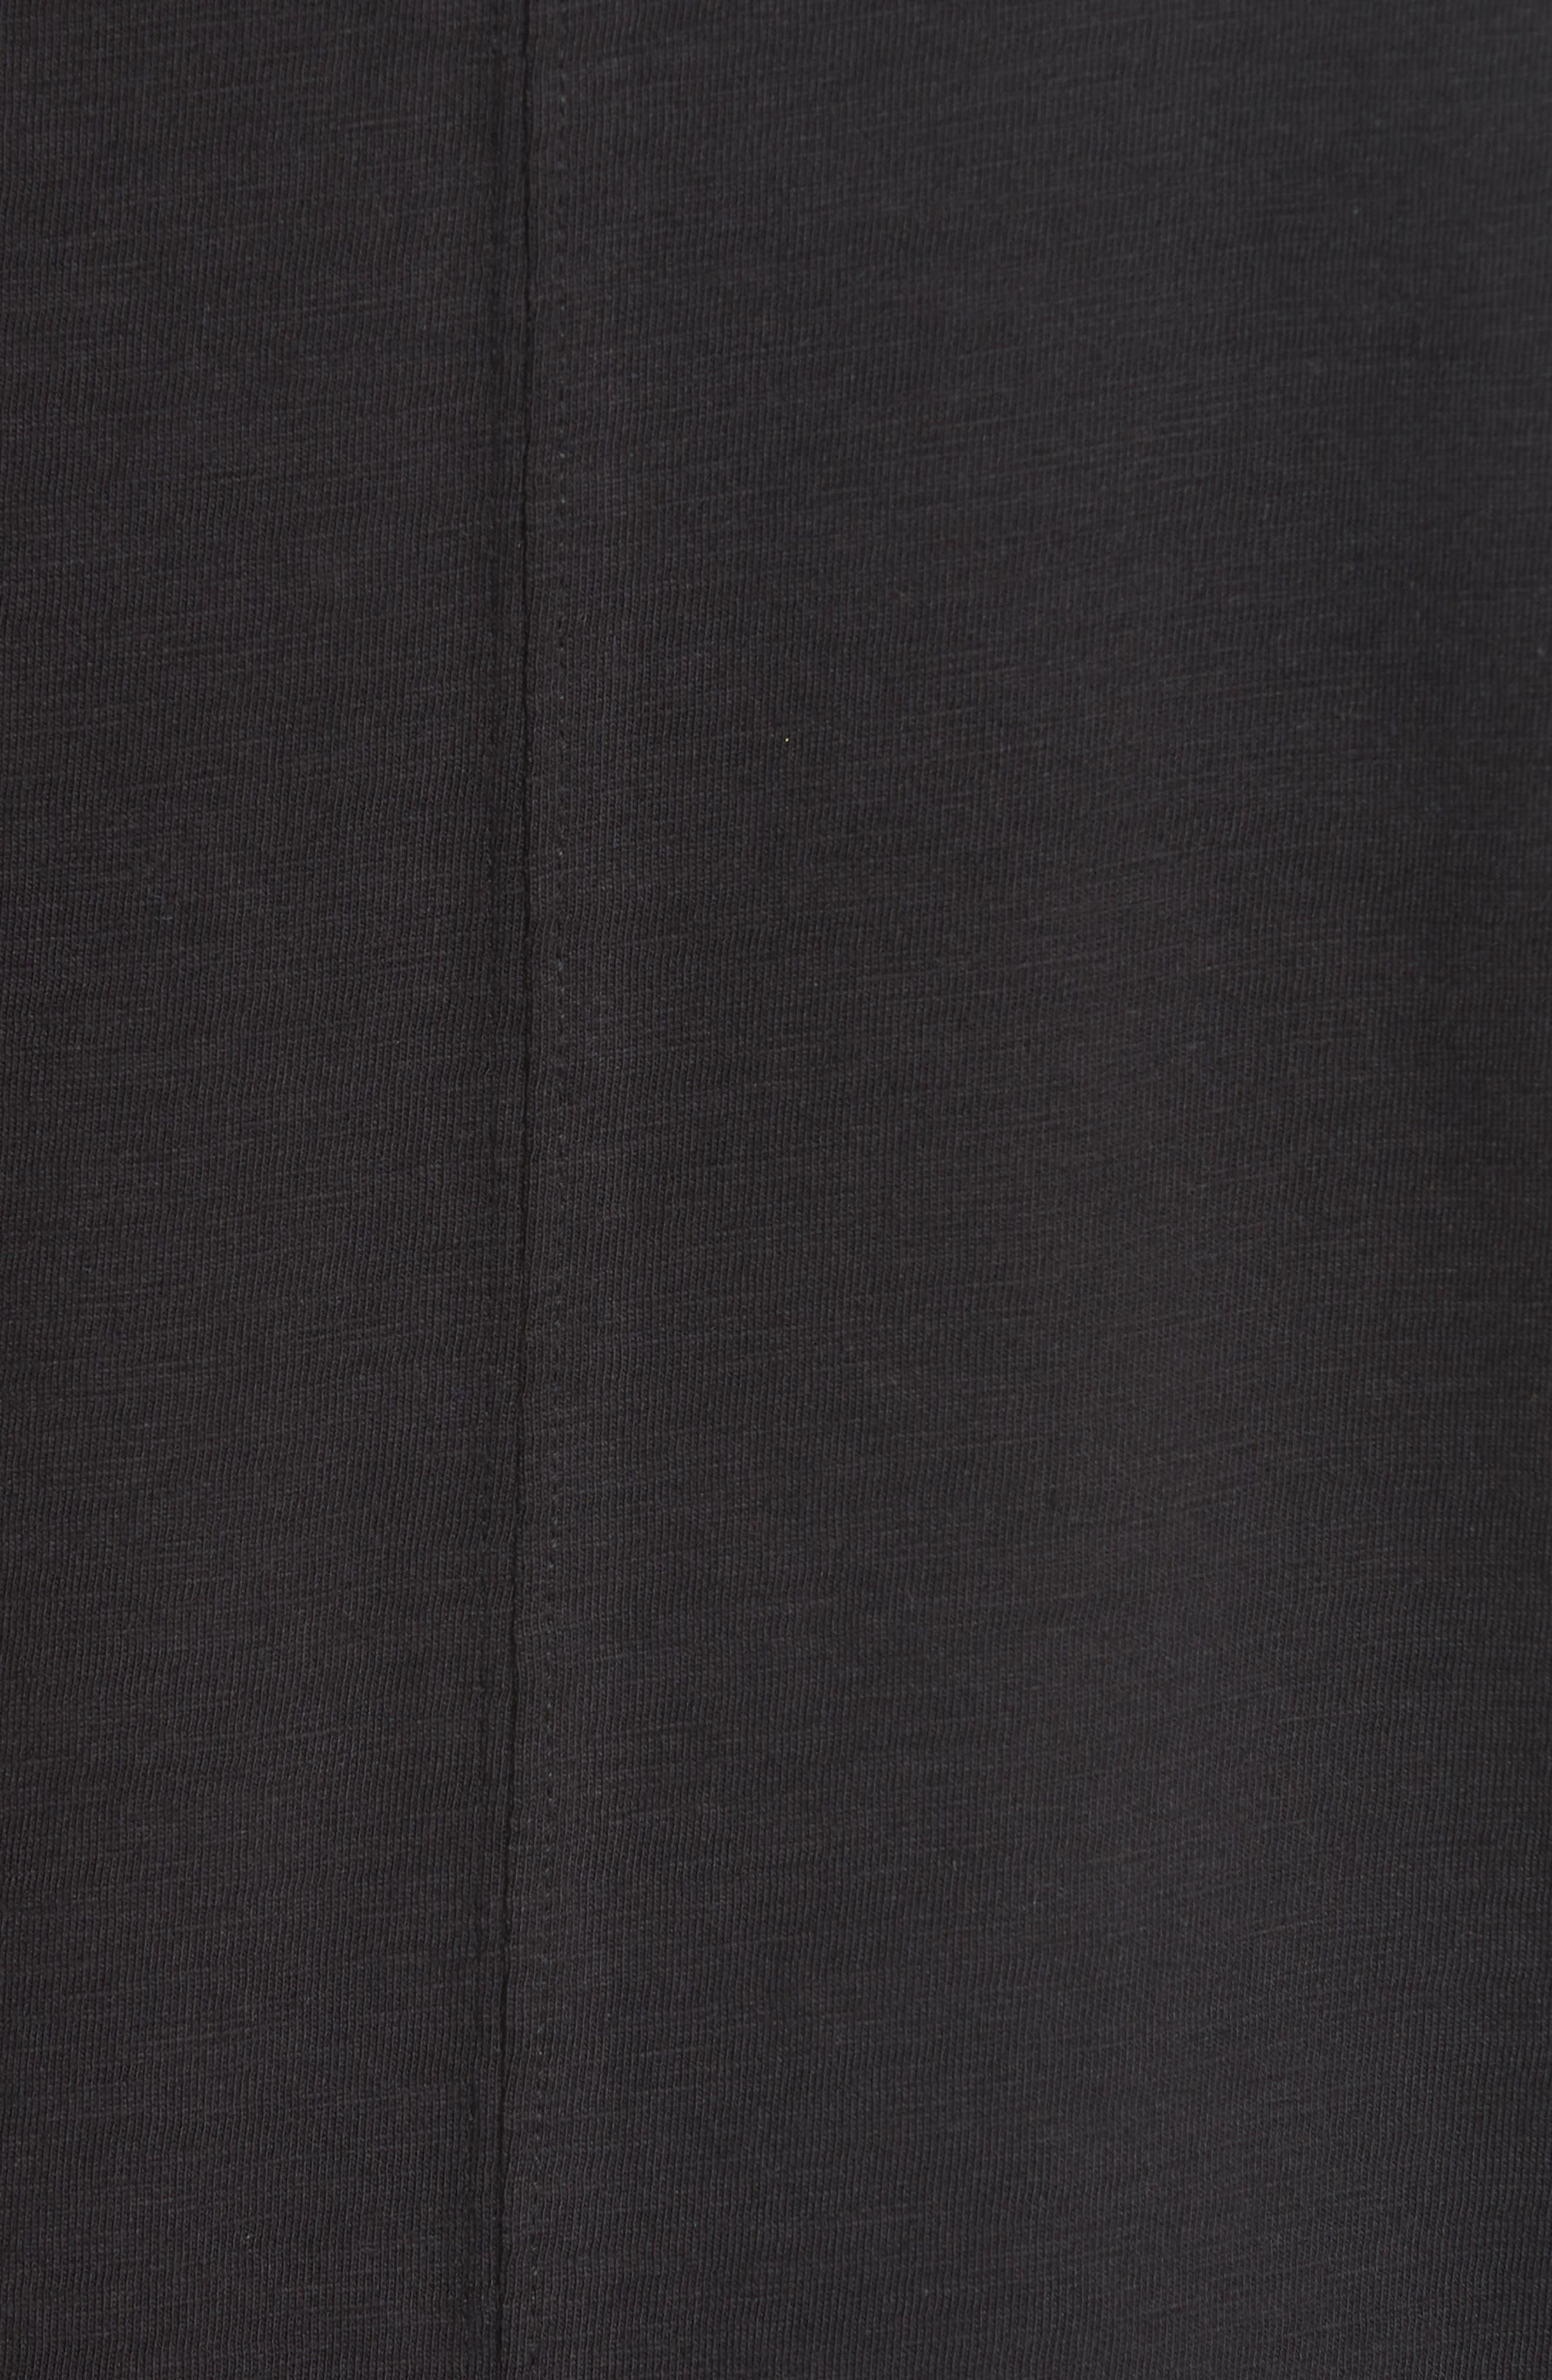 Panic Reversible Graphic T-Shirt,                             Alternate thumbnail 6, color,                             BLACK